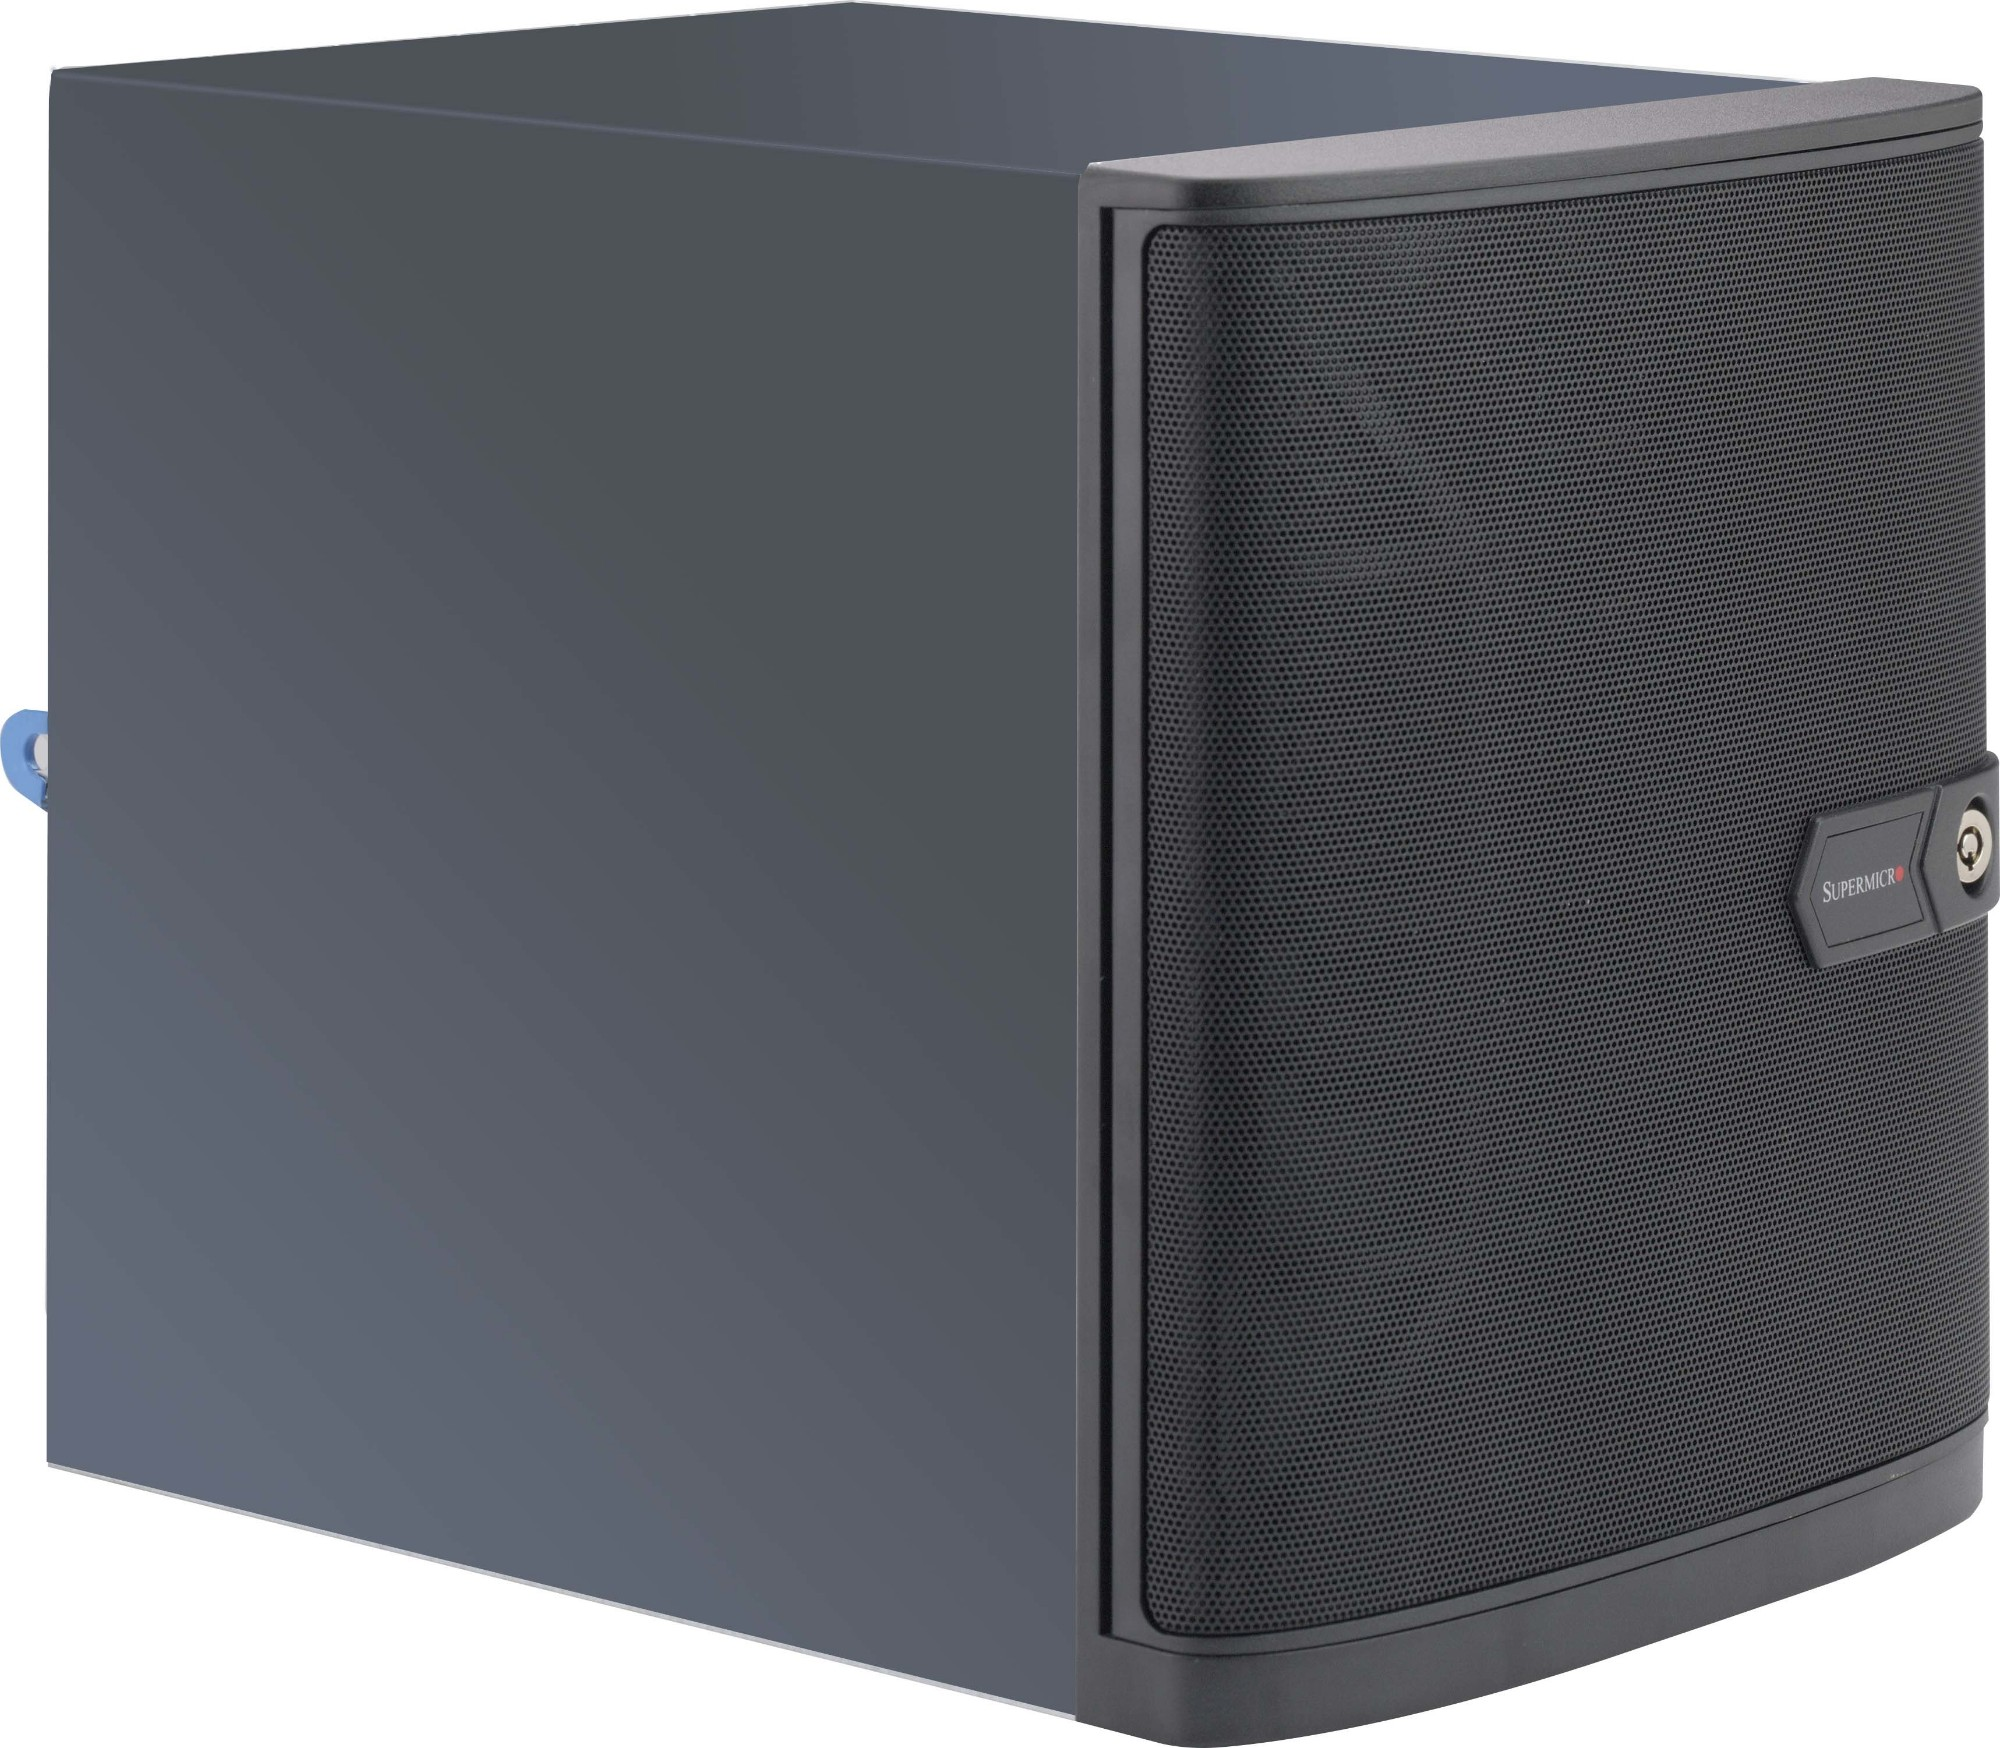 Supermicro CSE-721TQ-250B Mini-Tower 250W Black computer case